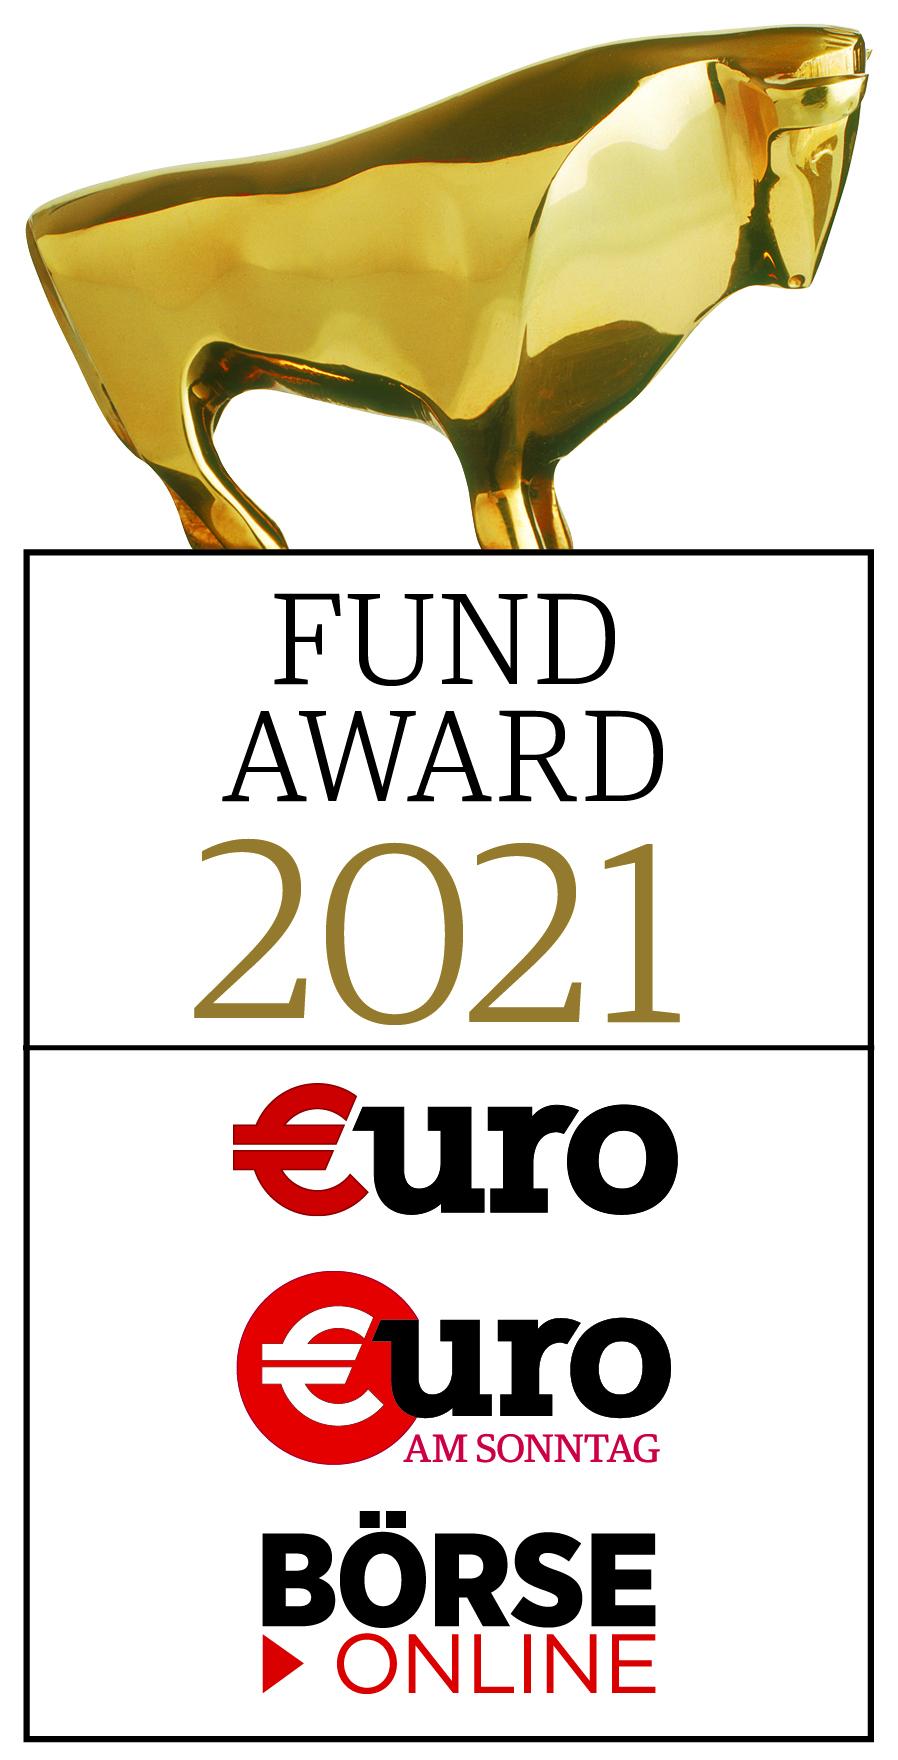 Fund Award 2021